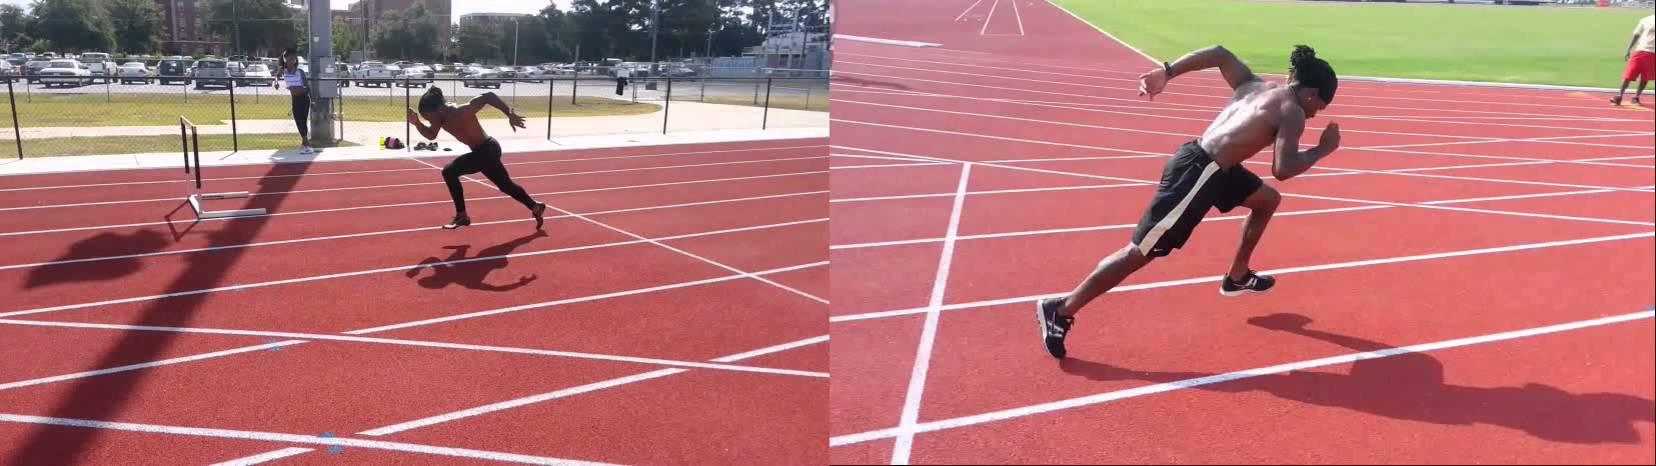 toe-drag-start-vs-no-toe-drag-start